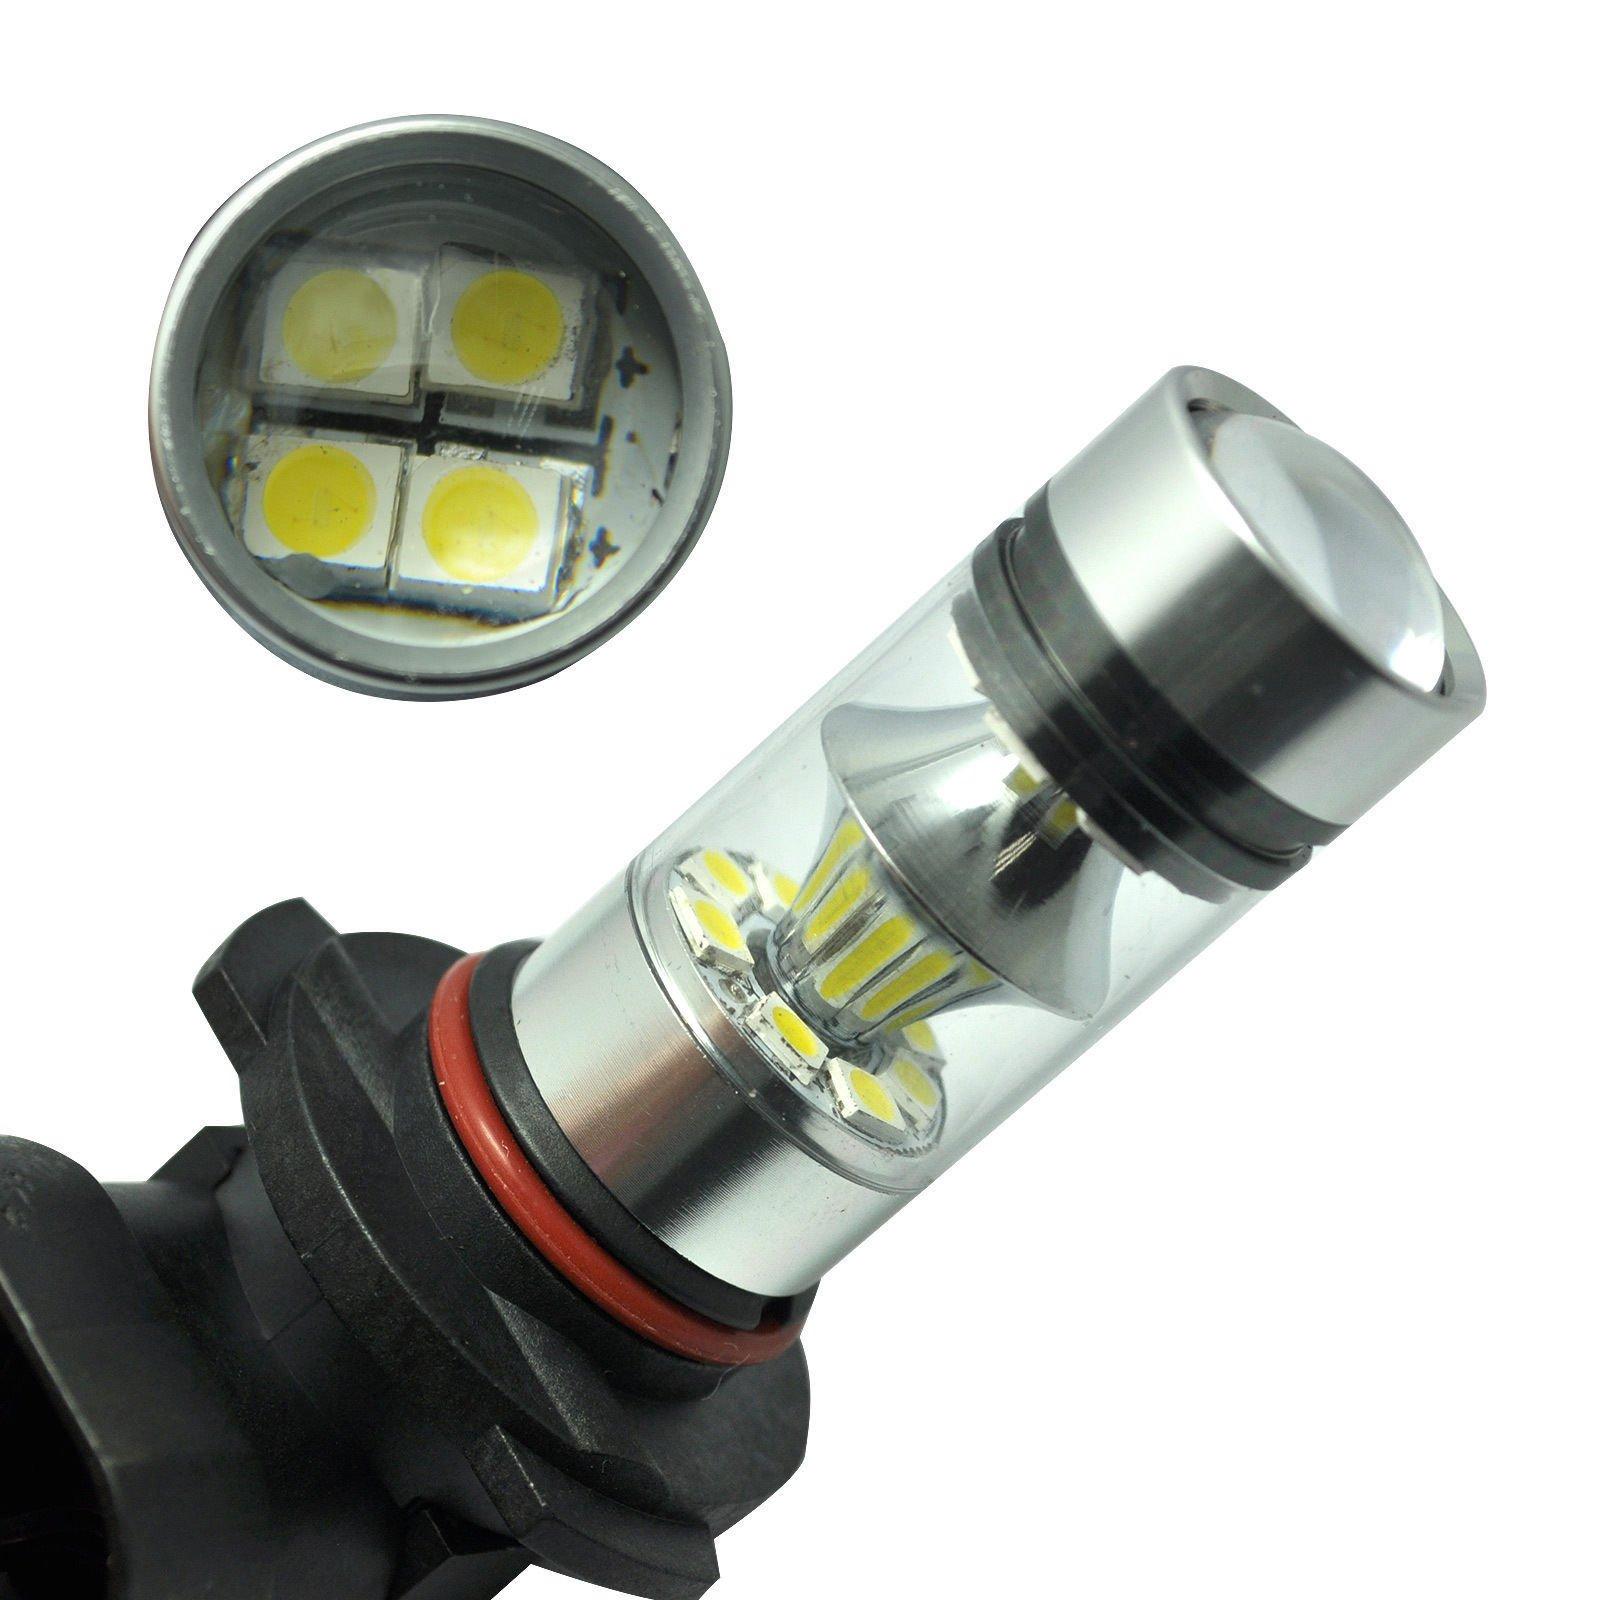 2 x 100W H10 9145 High Power CREE LED 6000K Super White Fog Light Lamp Bulbs by Carb Omar (Image #3)